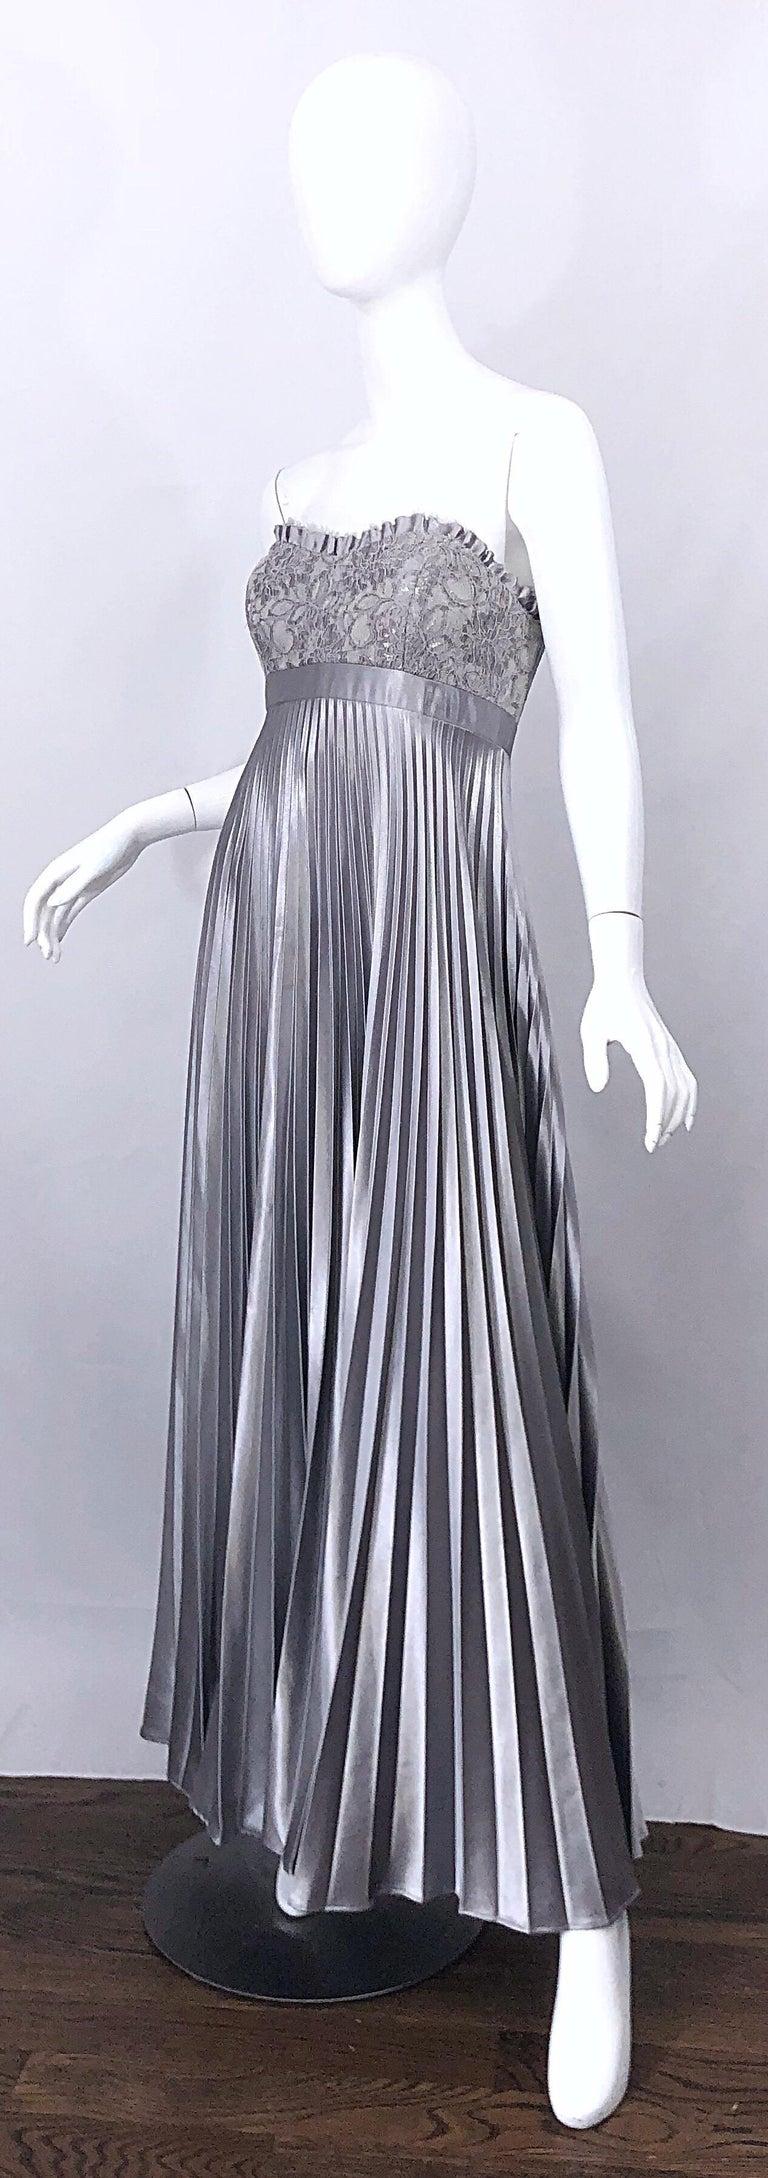 Beautiful Vintage Badgley Mischka Size 10 / 12 Silver Metallic Beaded Gown Dress For Sale 1